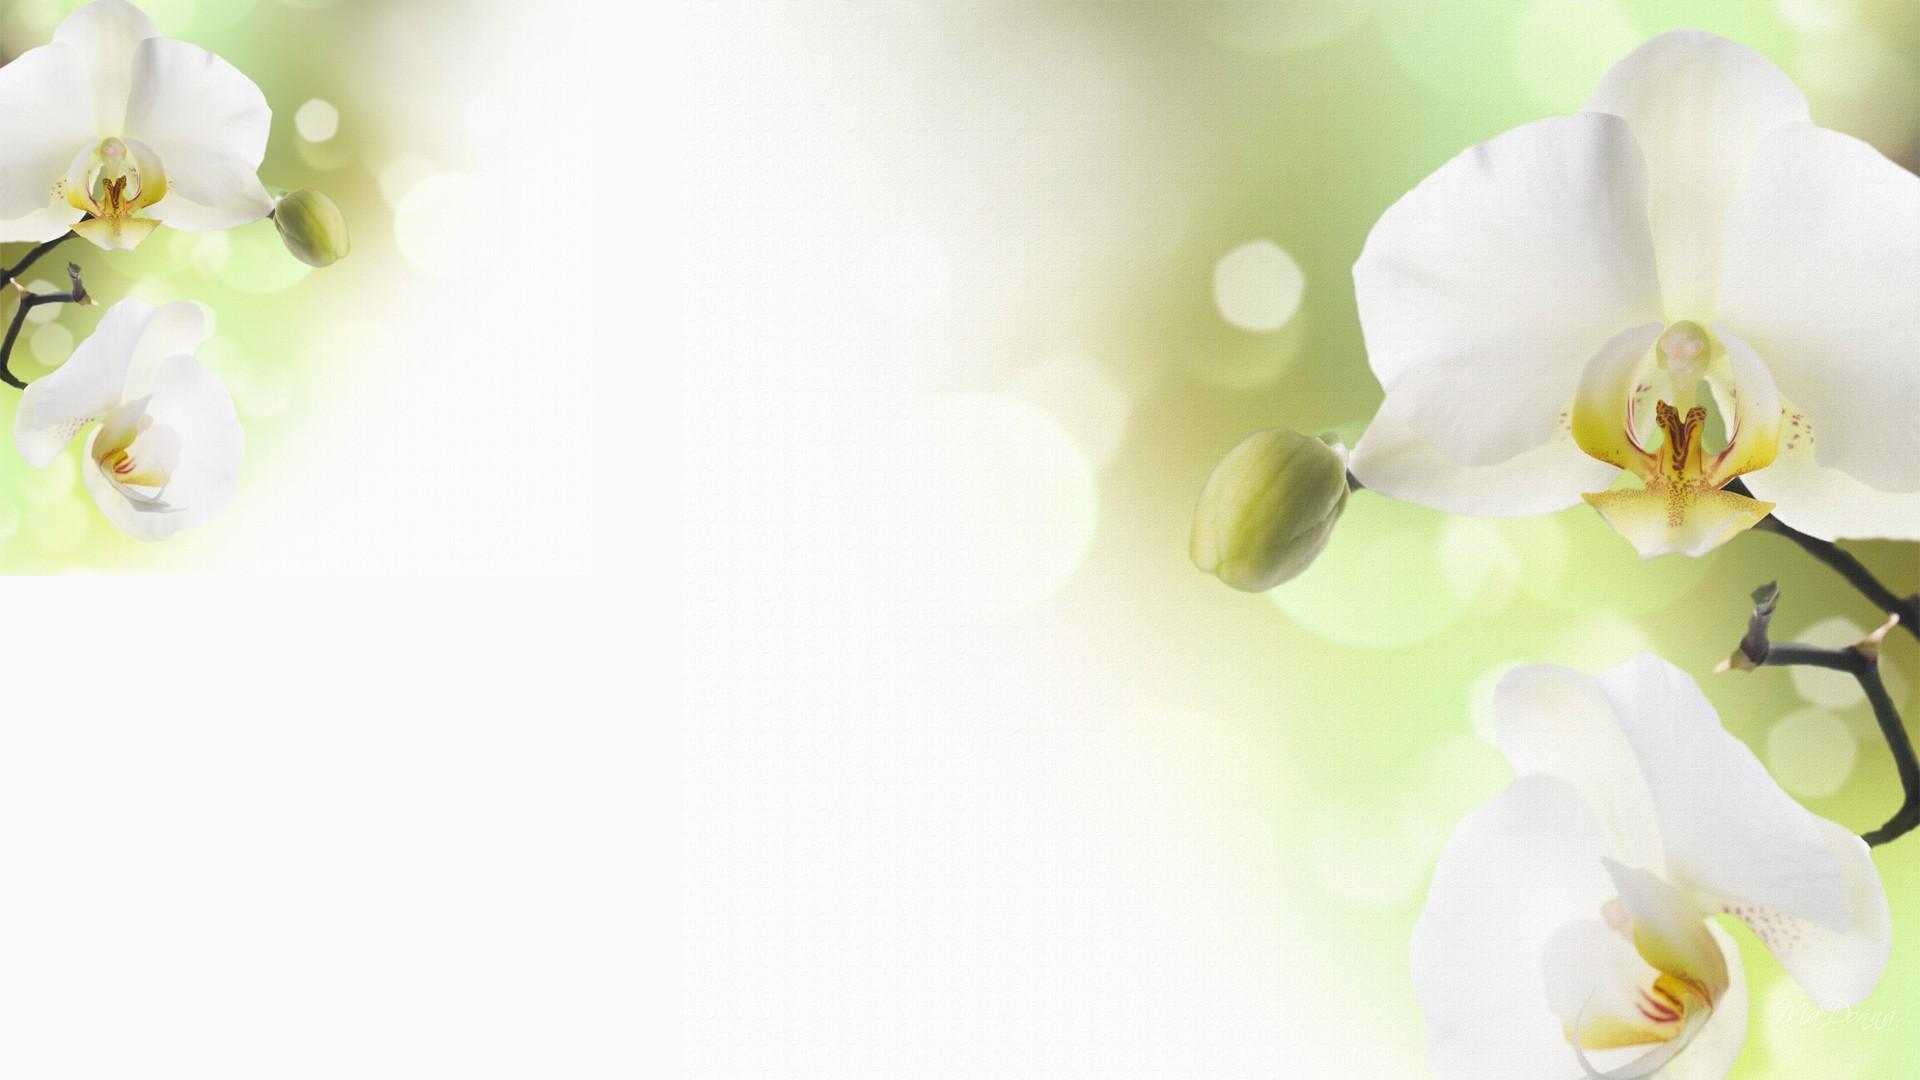 White orchid wallpaper wallpapersafari - White orchid flowers desktop wallpapers ...